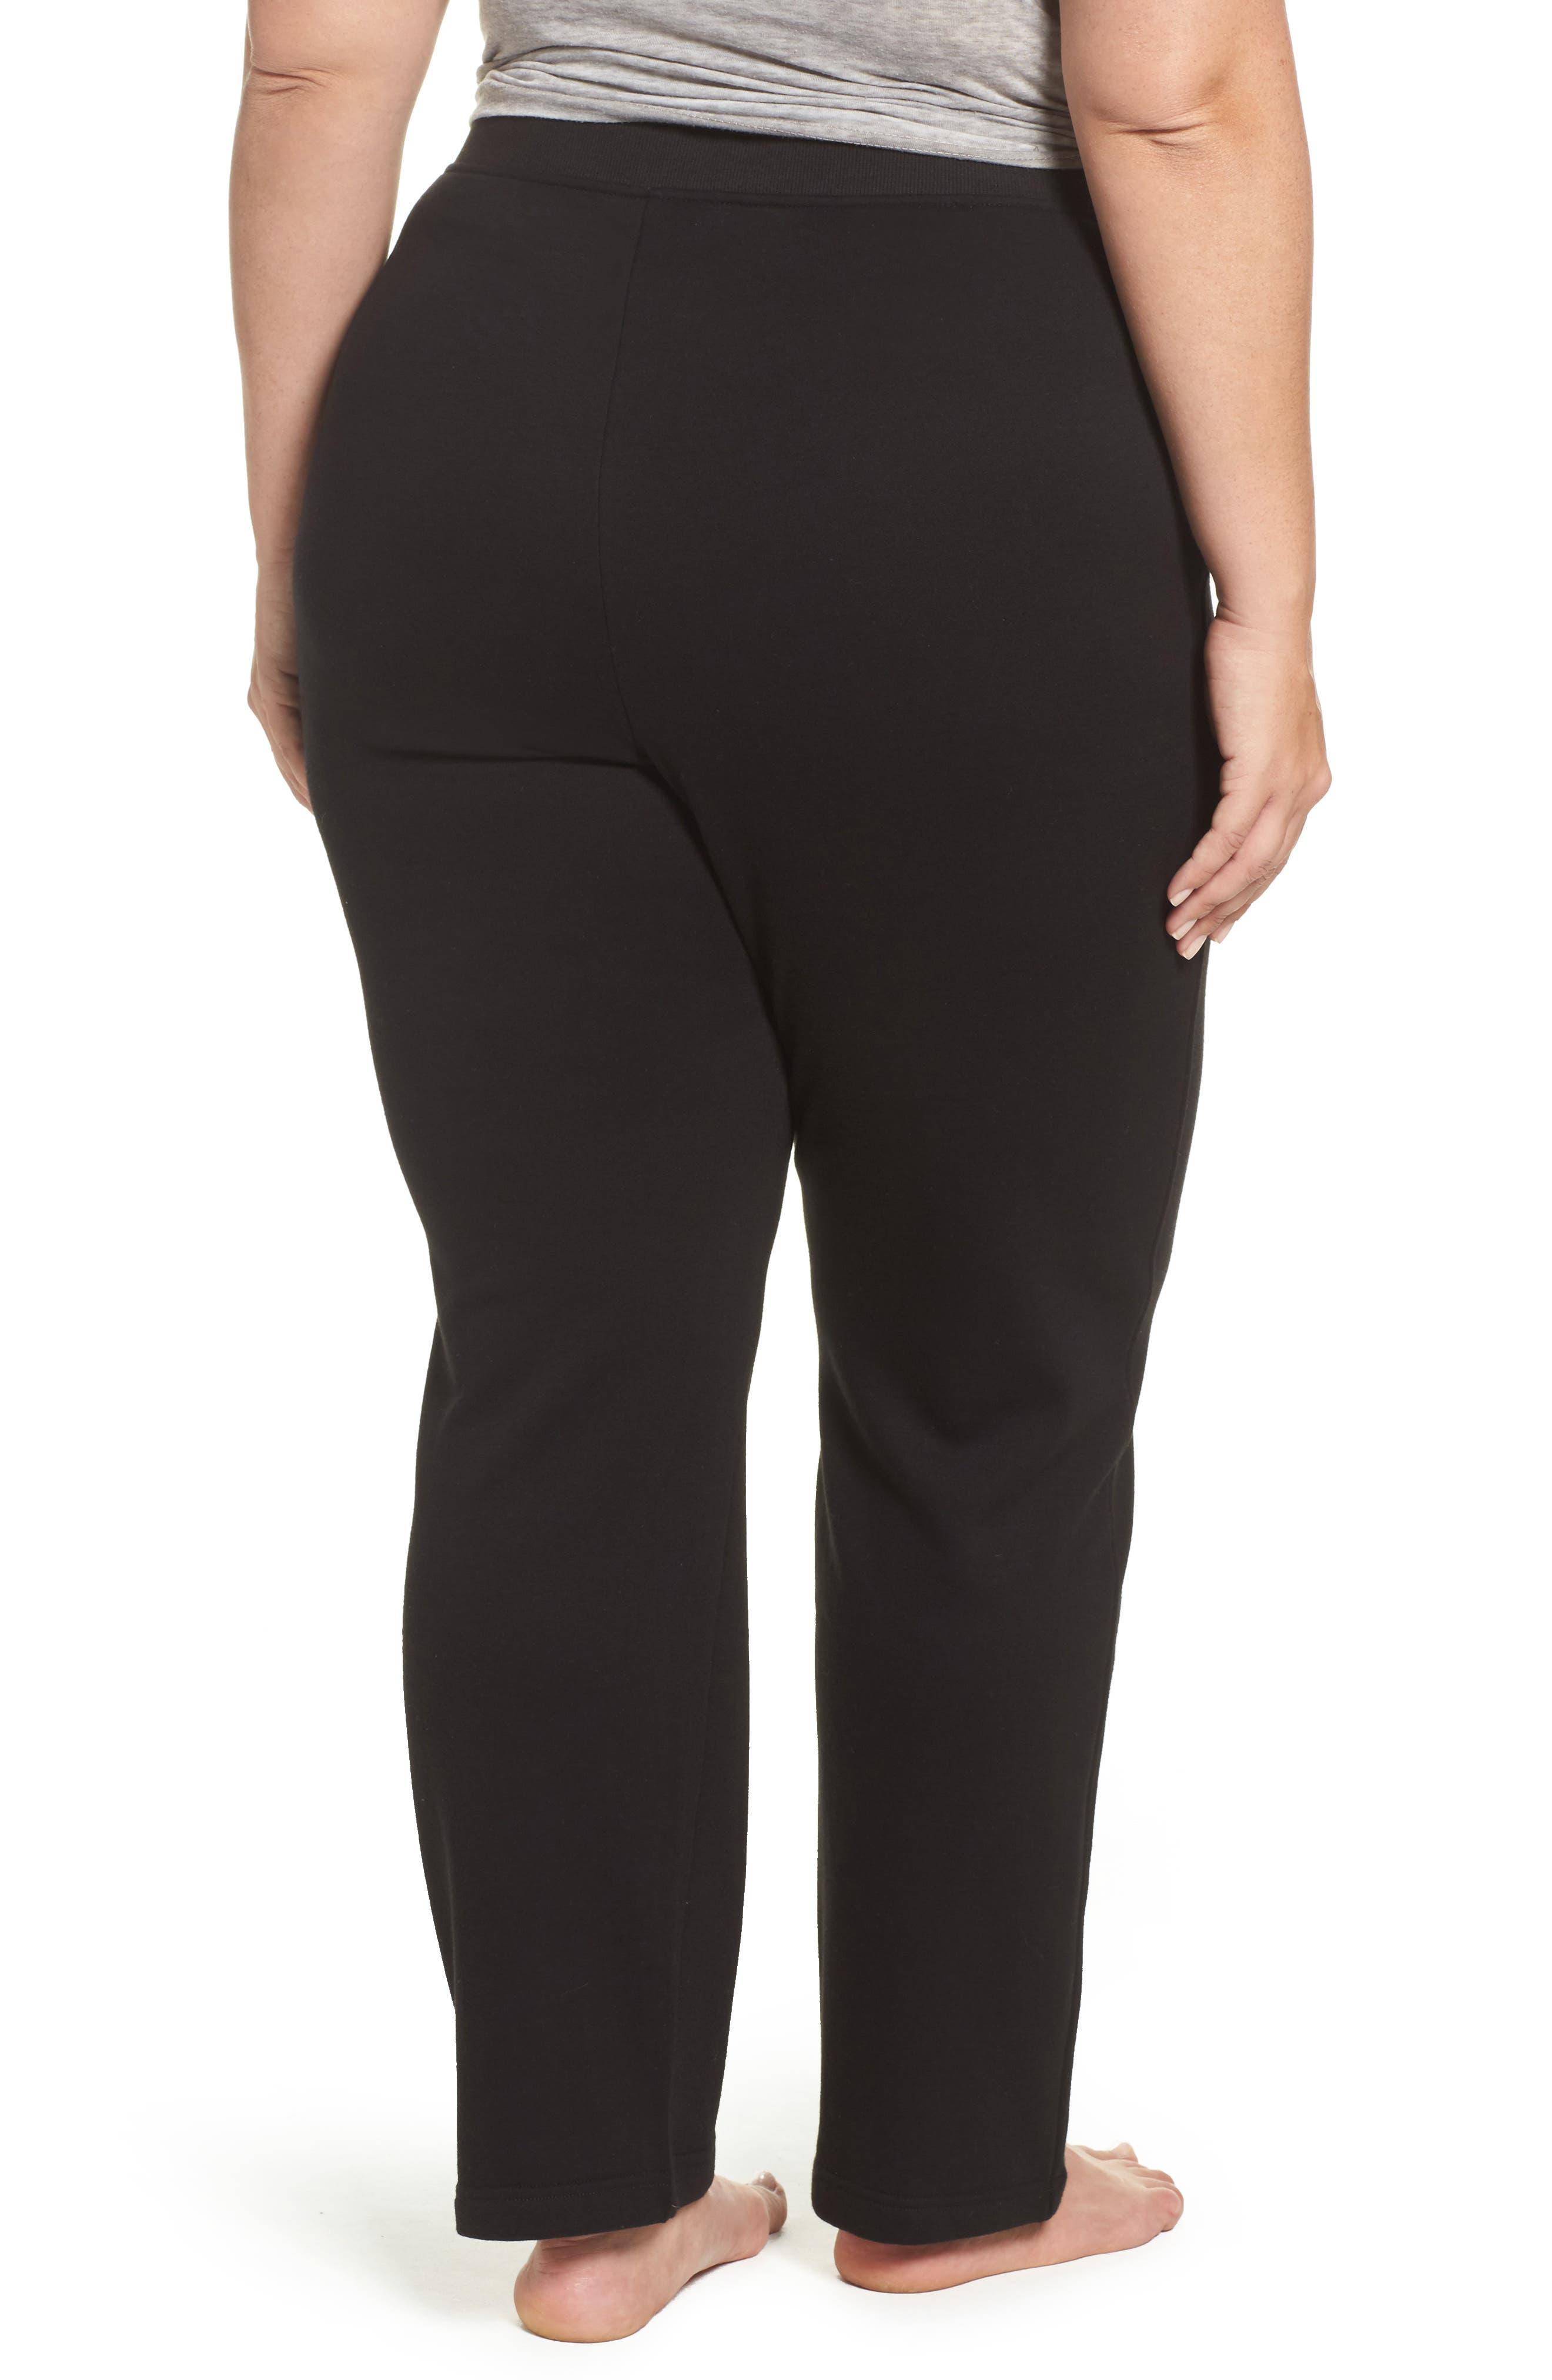 Penny Fleece Sweatpants,                             Alternate thumbnail 2, color,                             BLACK